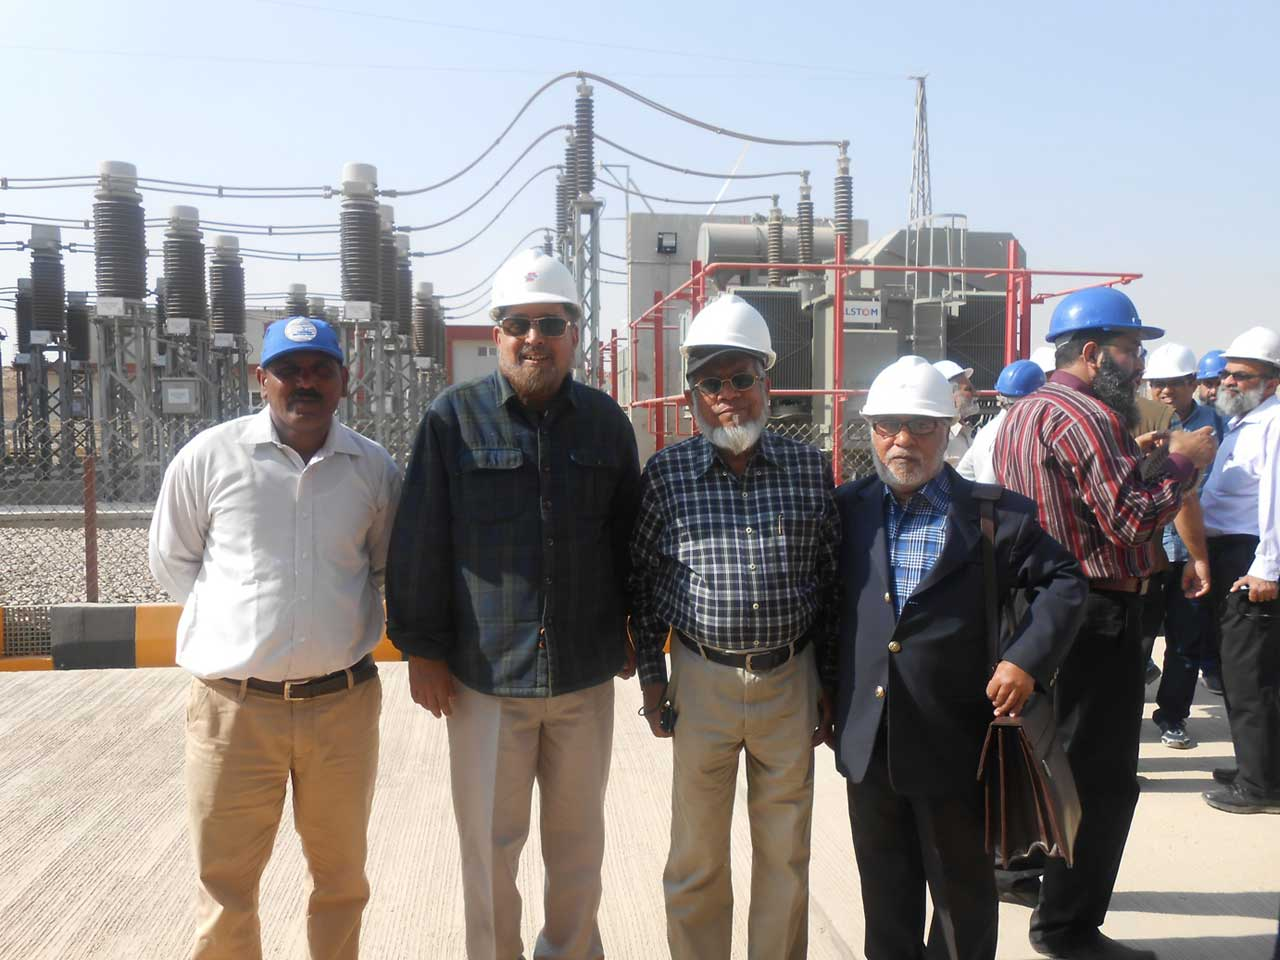 YEL Staff, Engr. Qaiser Jawed Ali Khan, Engr. Iqbal Ahmed Khan, Engr. Gulzar Memon